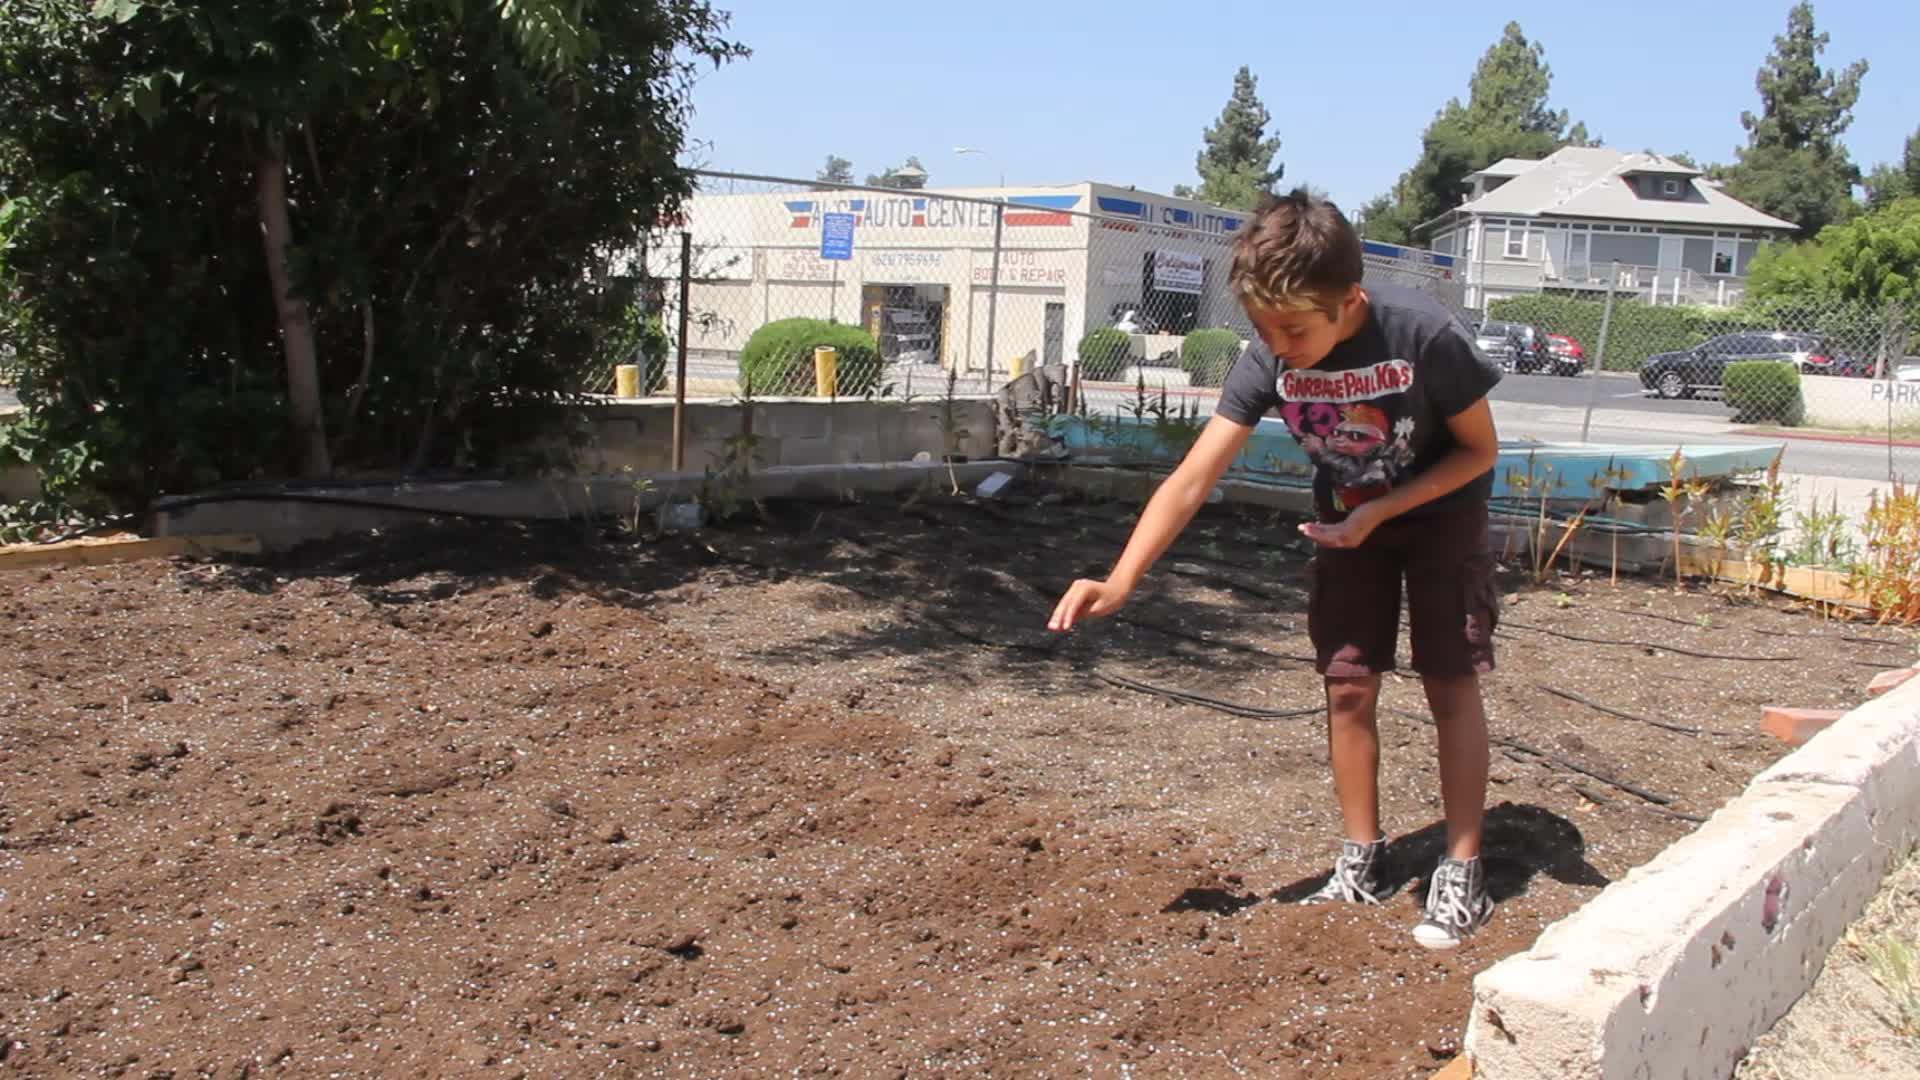 Planting at Side Street Projects, Pasadena, California July 2014